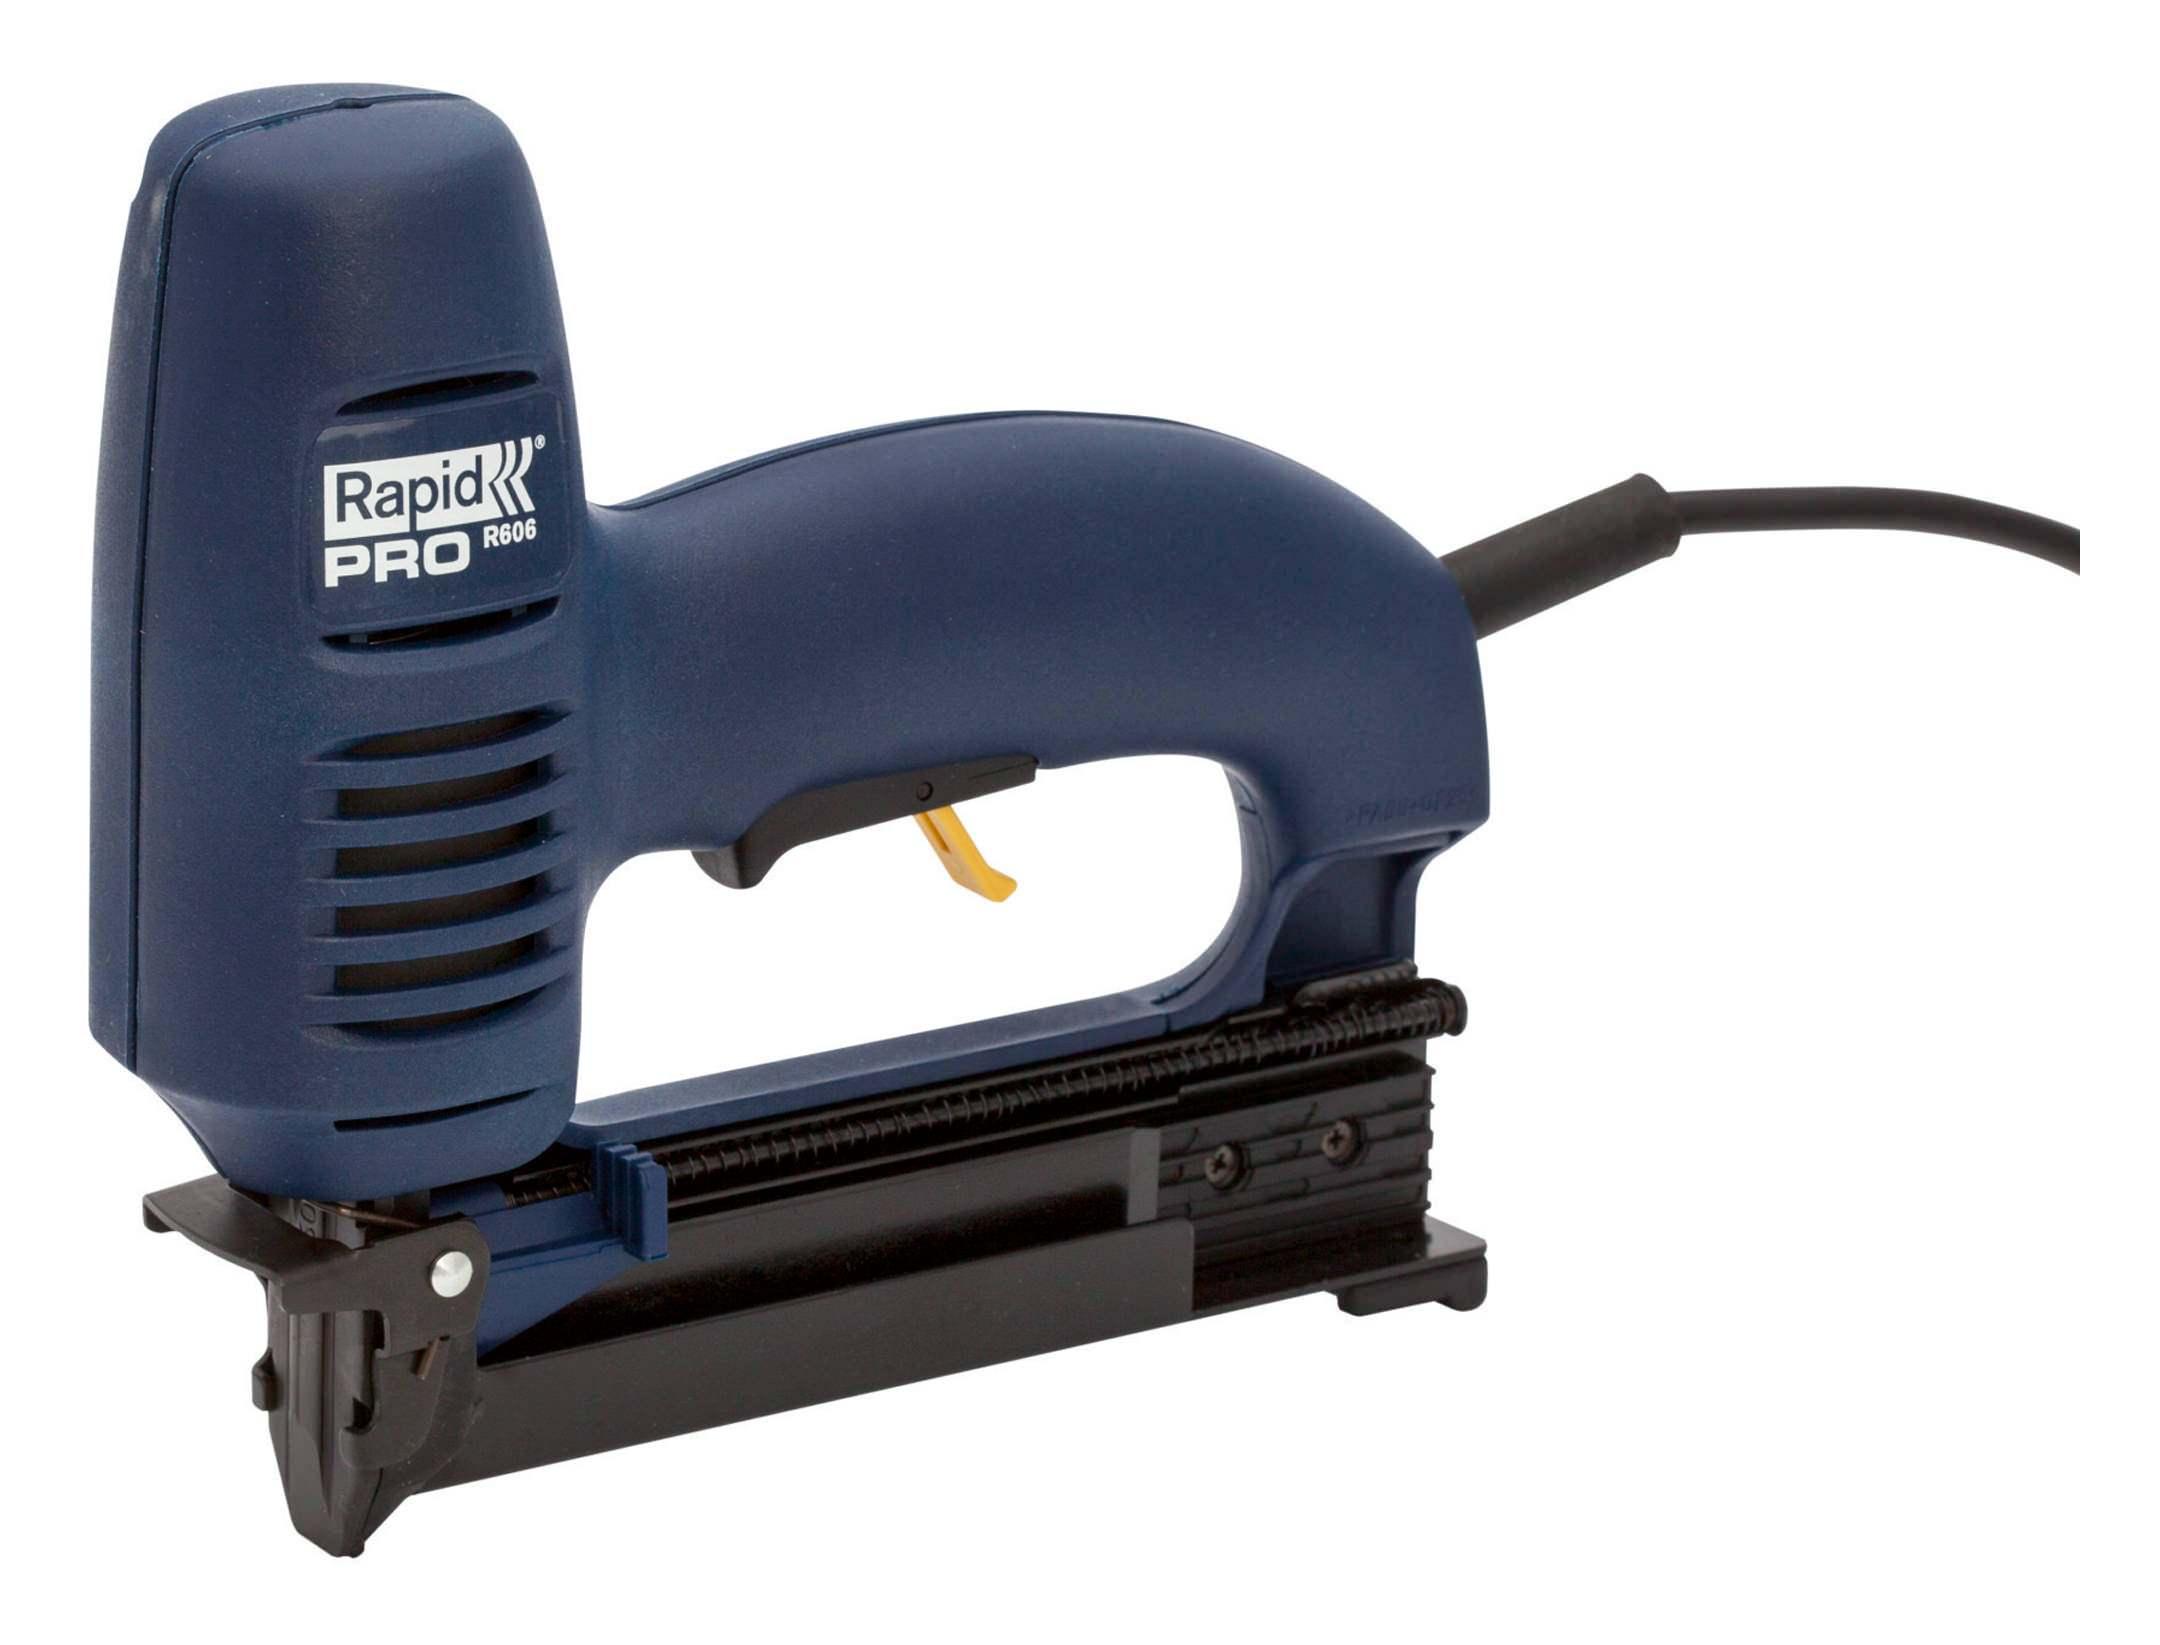 Rapid Elektrotacker R606 - 10643001